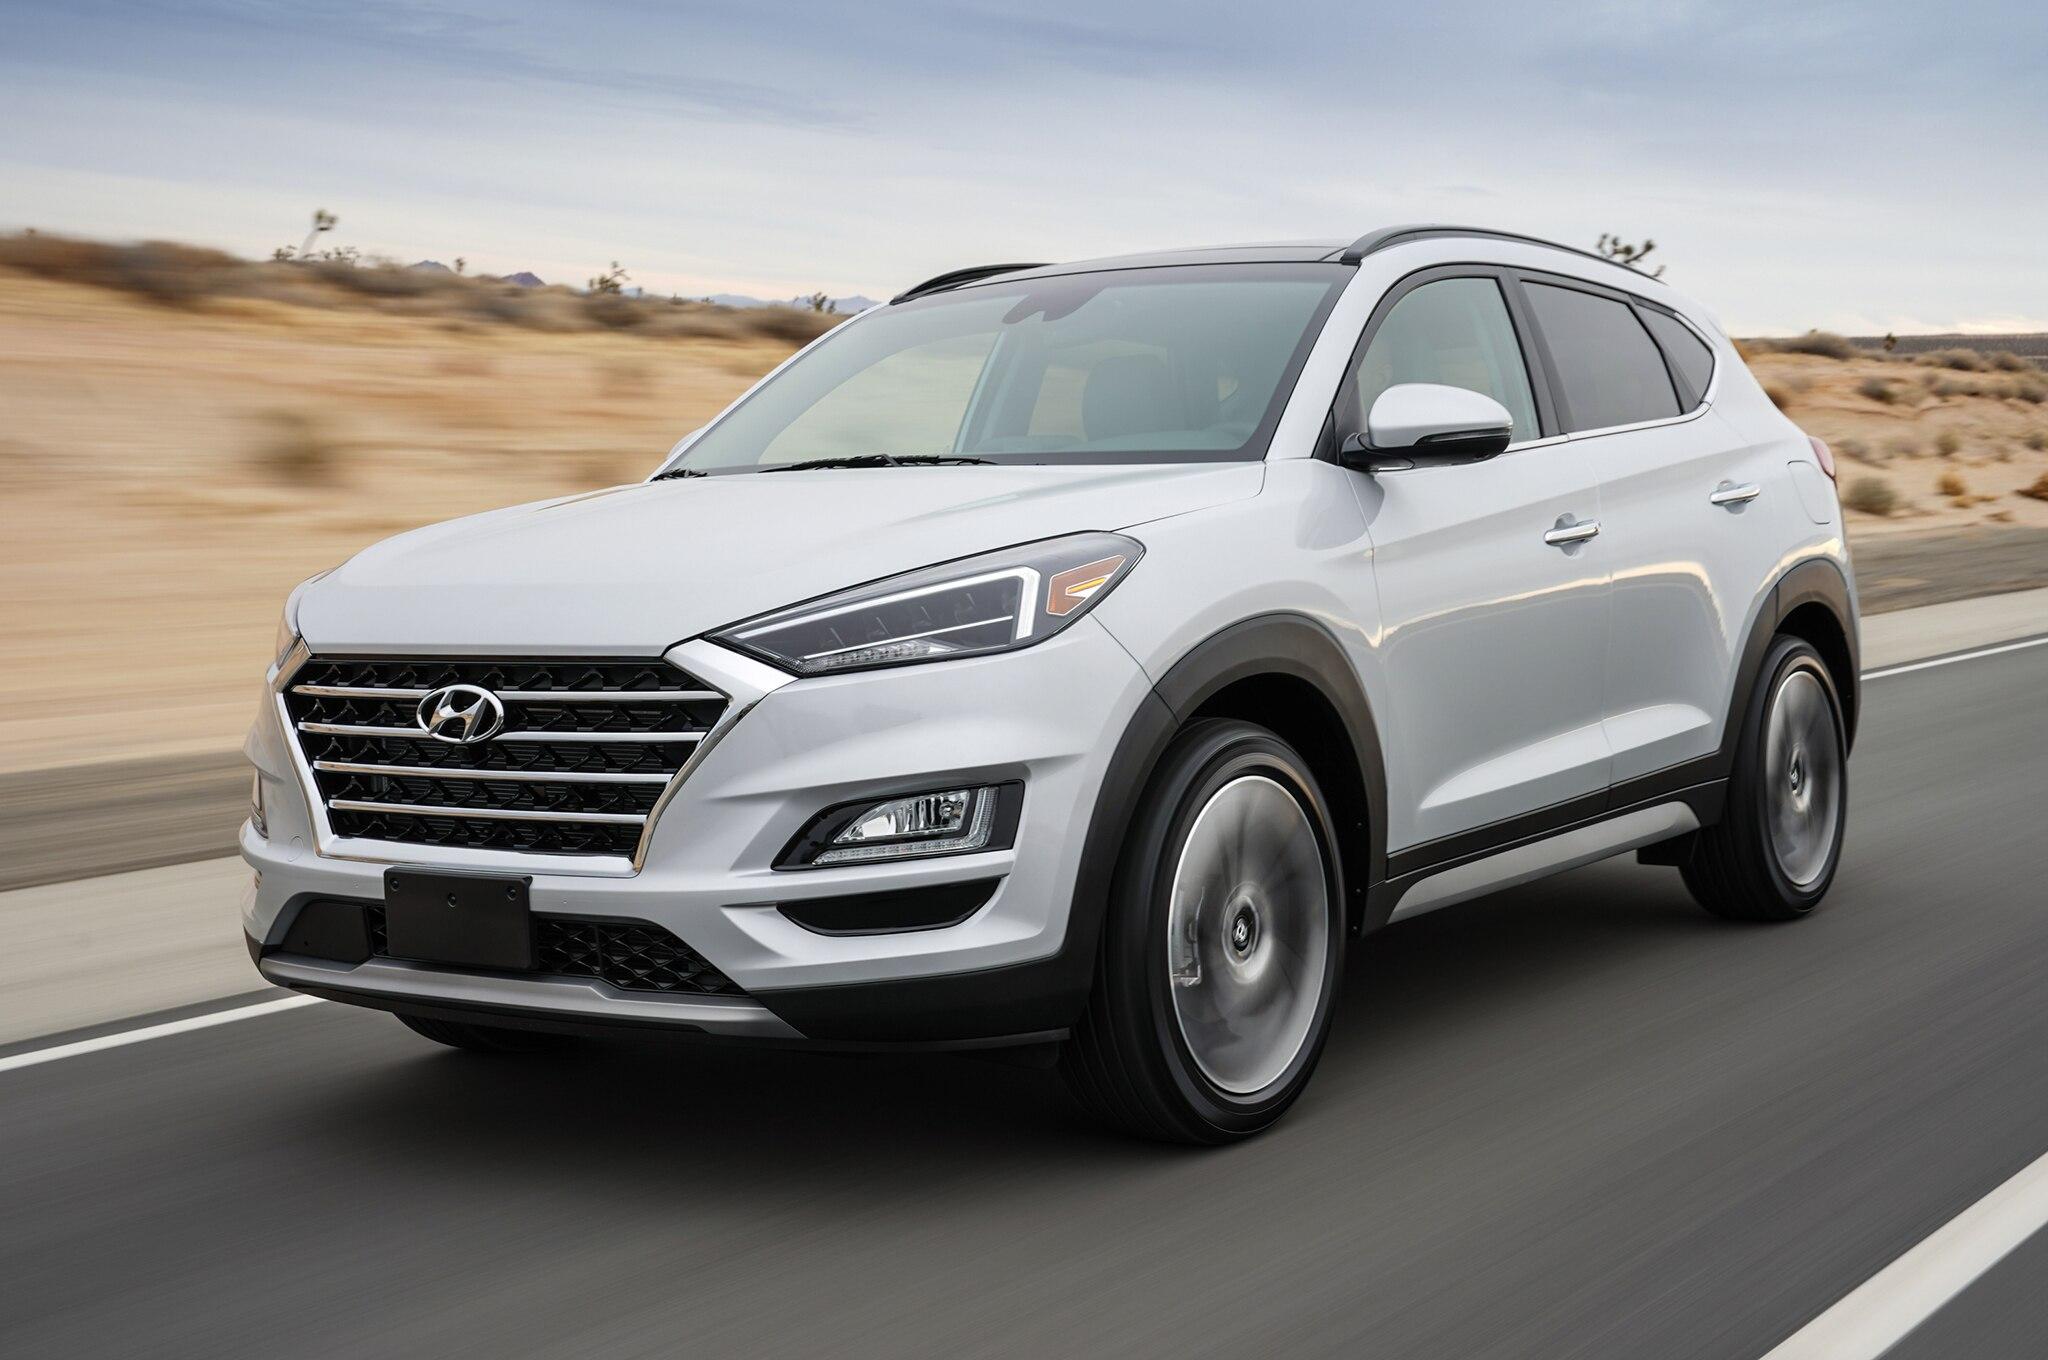 2015 - [Hyundai] Tucson III - Page 8 2019-Hyundai-Tucson-front-three-quarter-in-motion-19